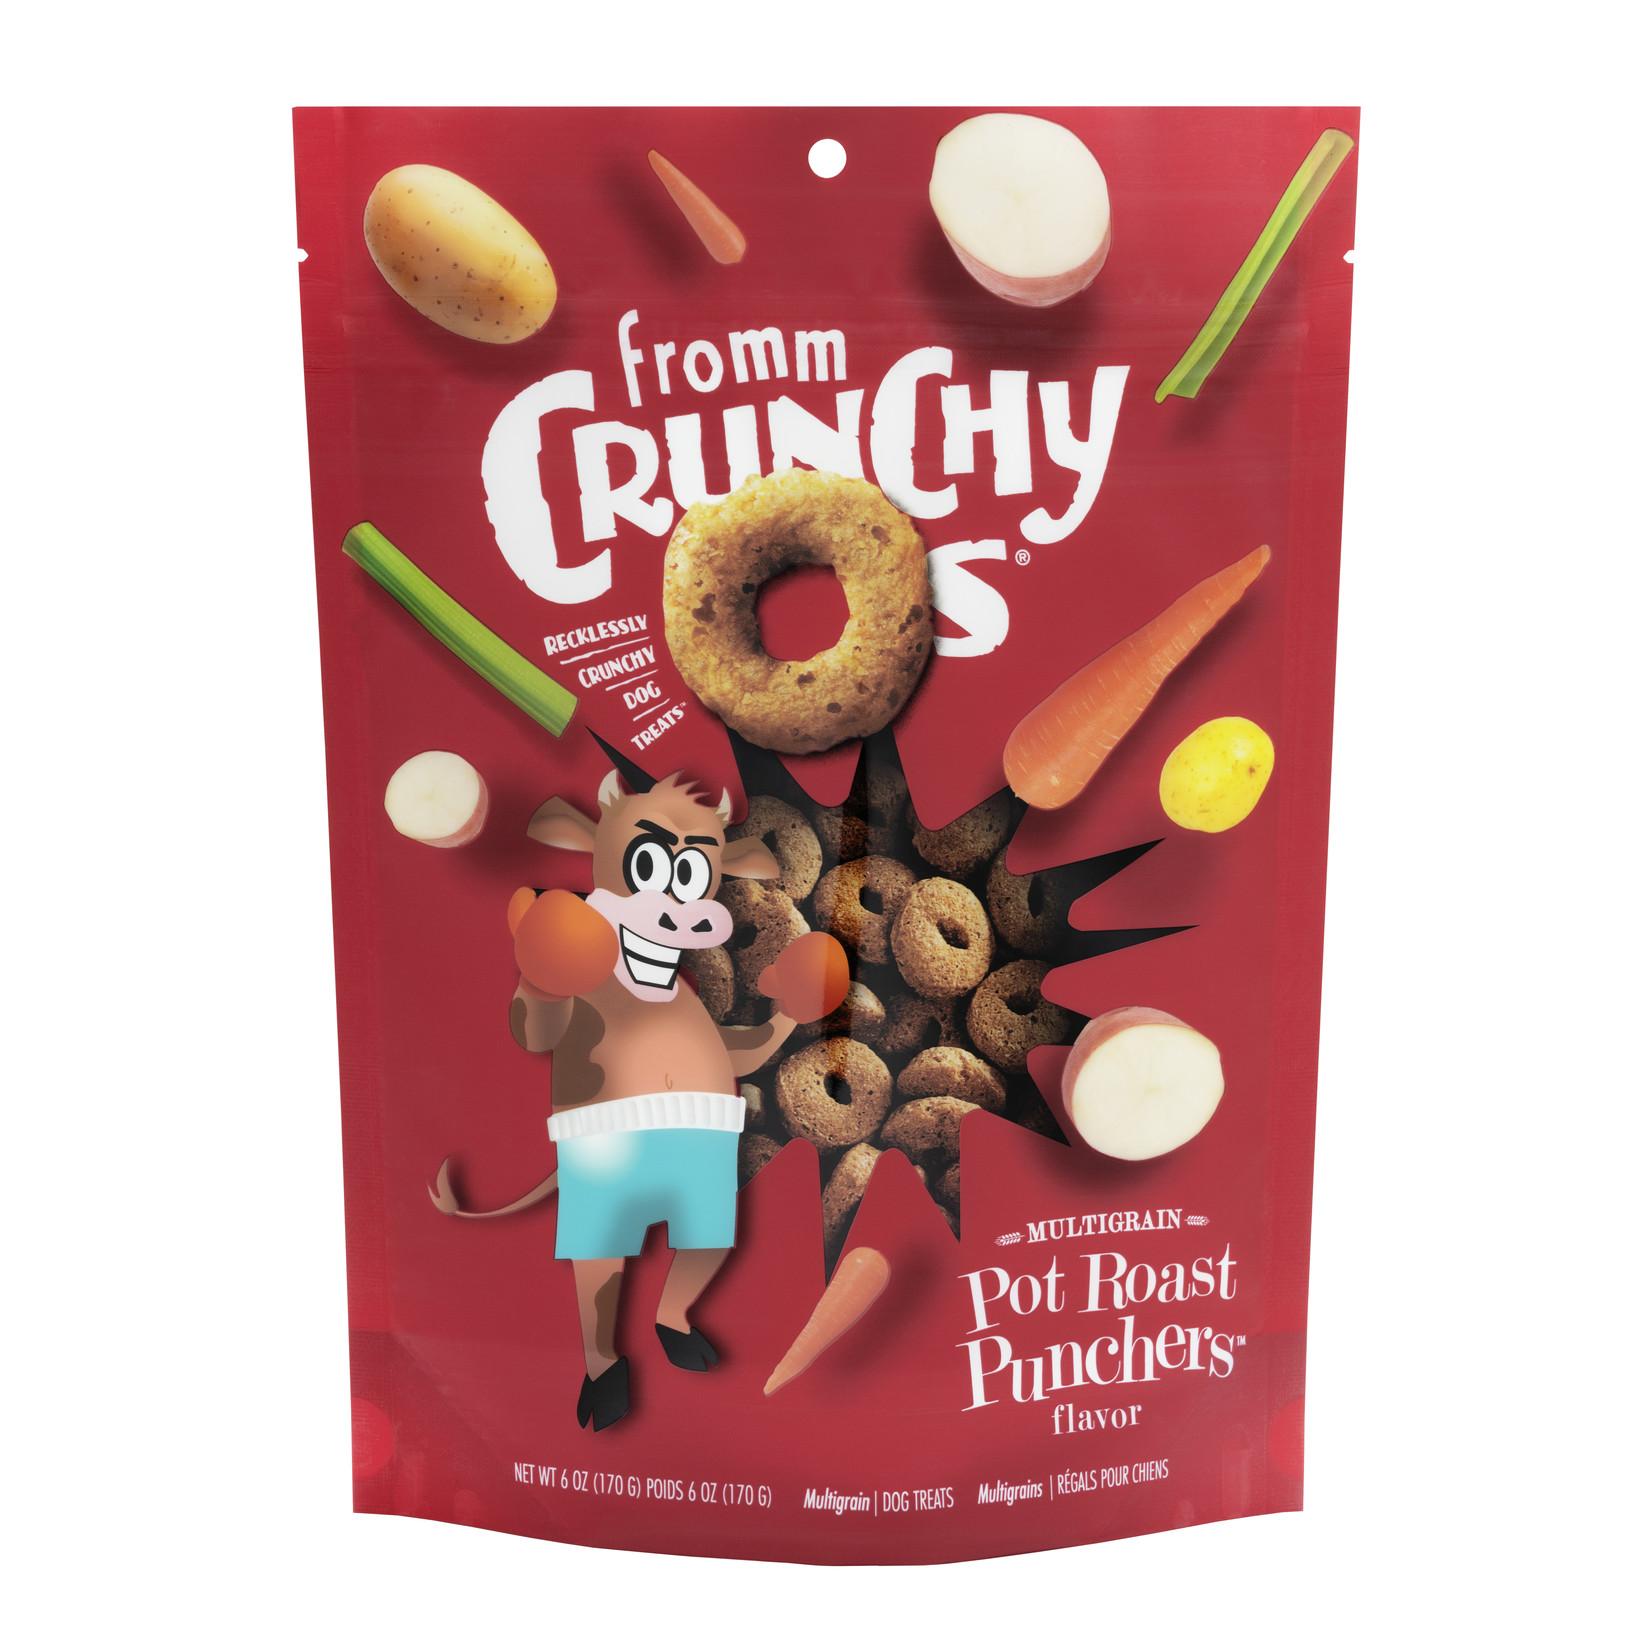 Fromm Family Fromm Crunchy O's Pot Roast Punchers Dog Treats 6oz